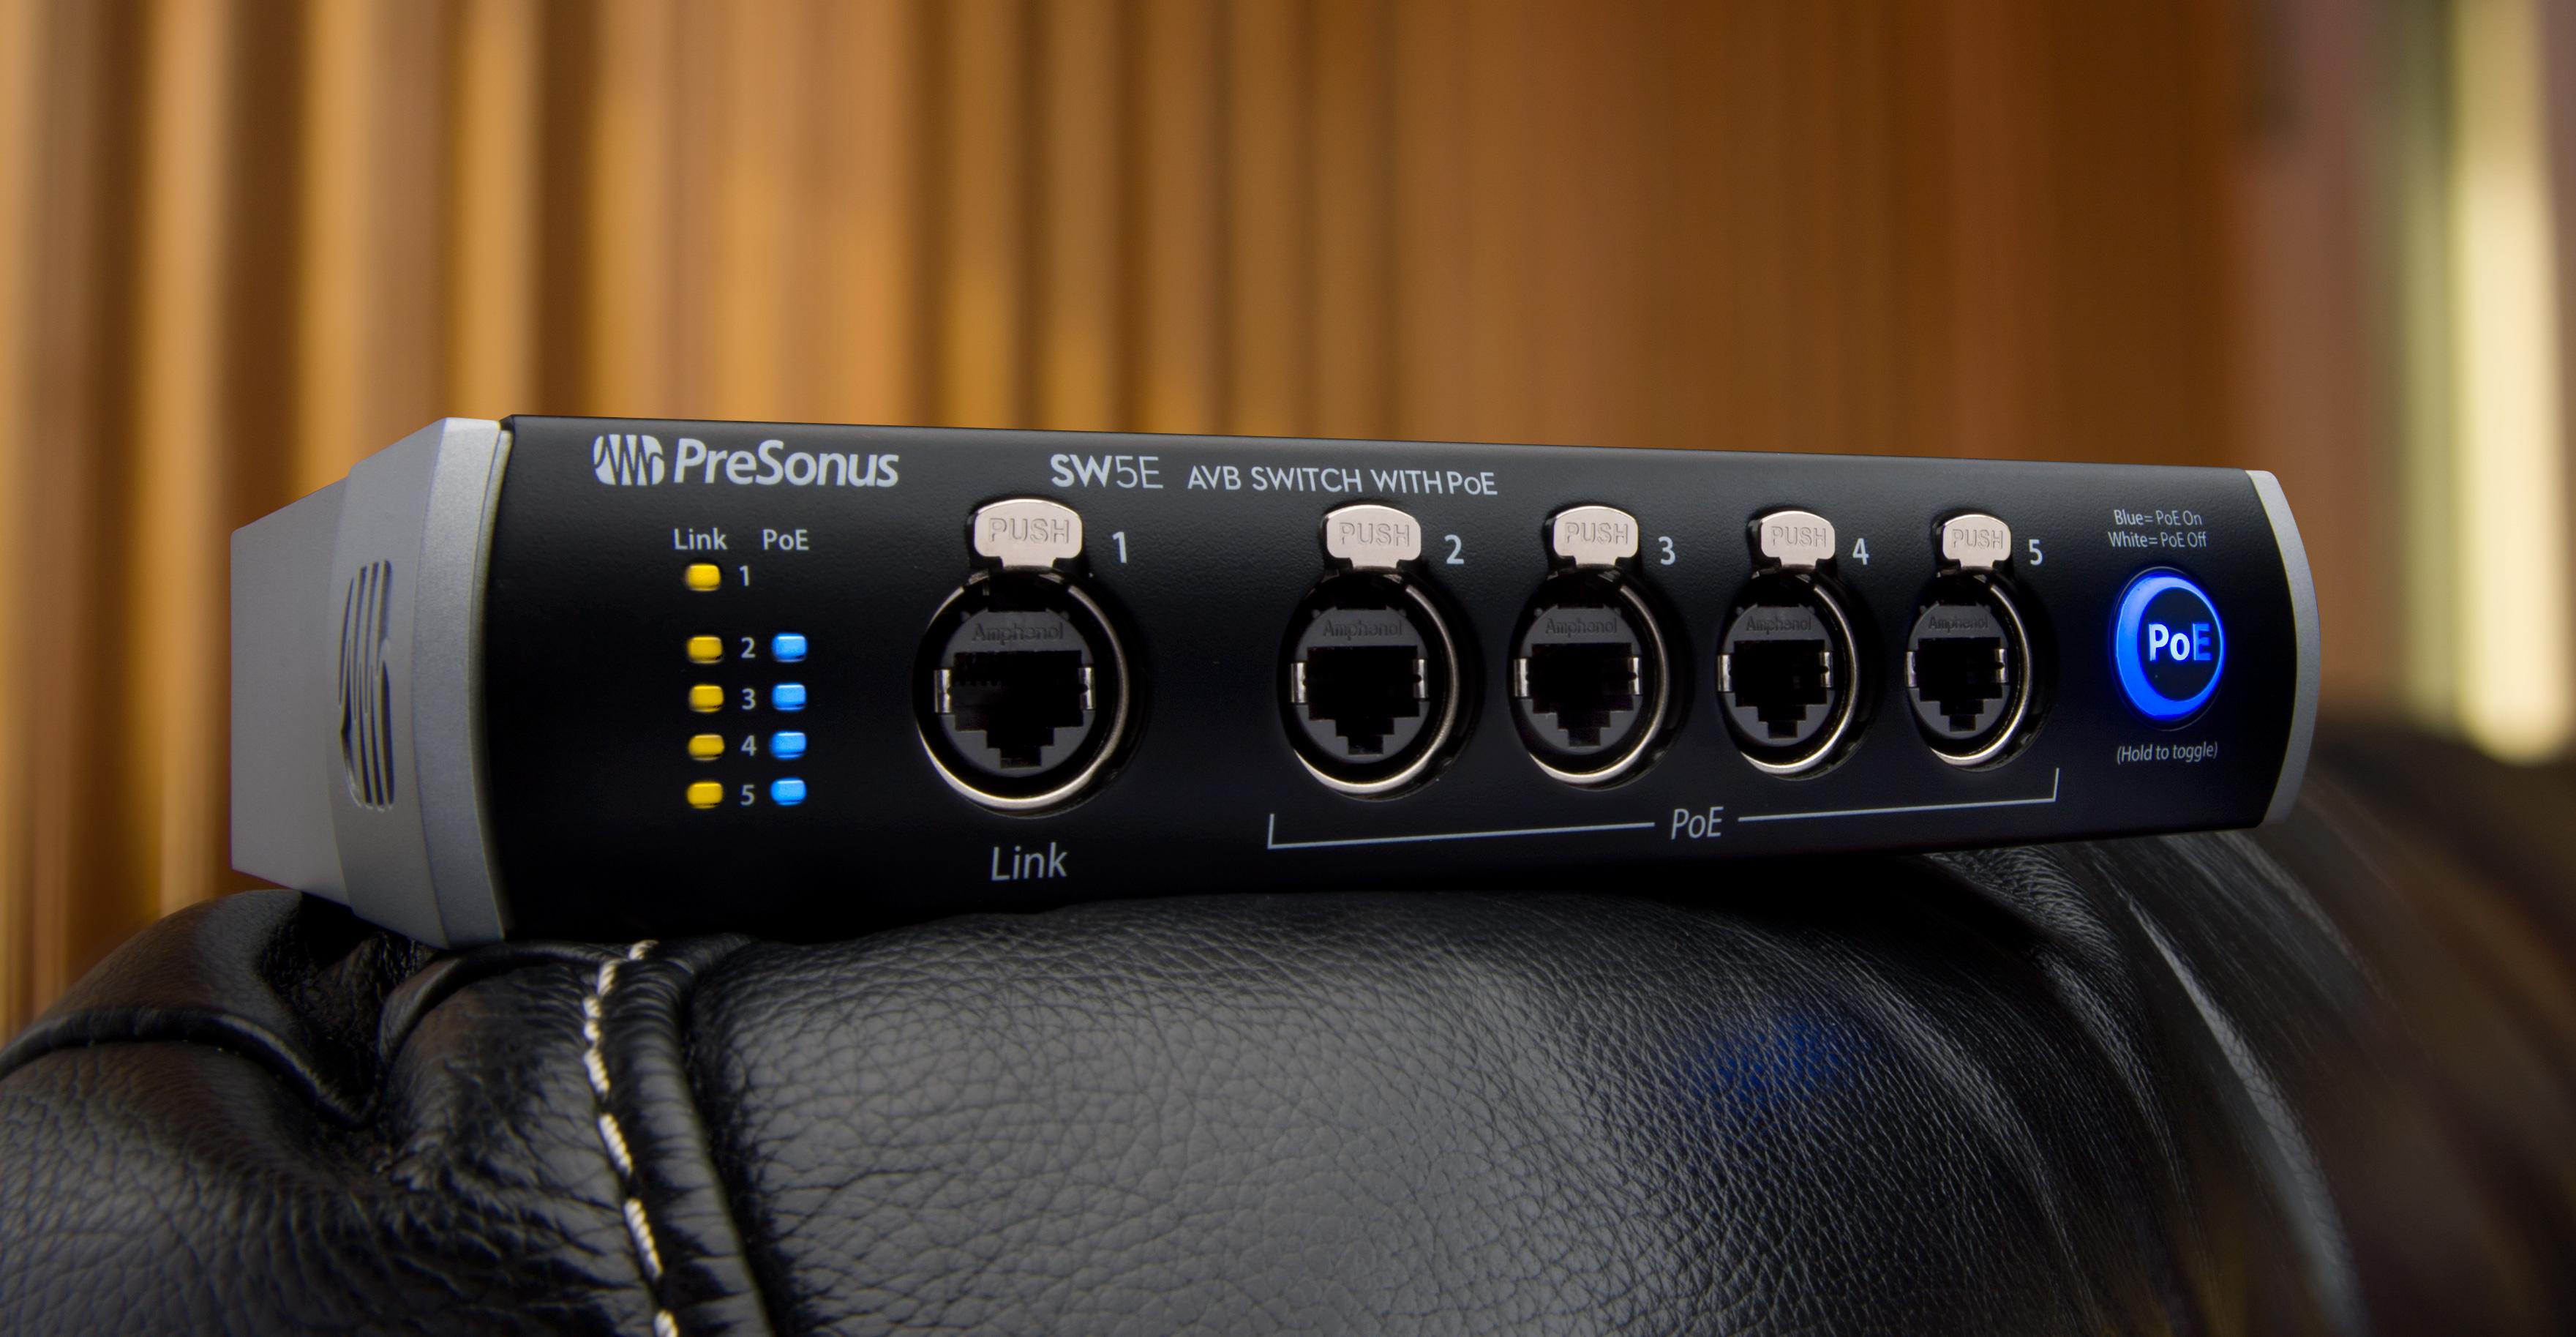 PreSonus SW5E AVB Switch a Great Choice for Live Sound